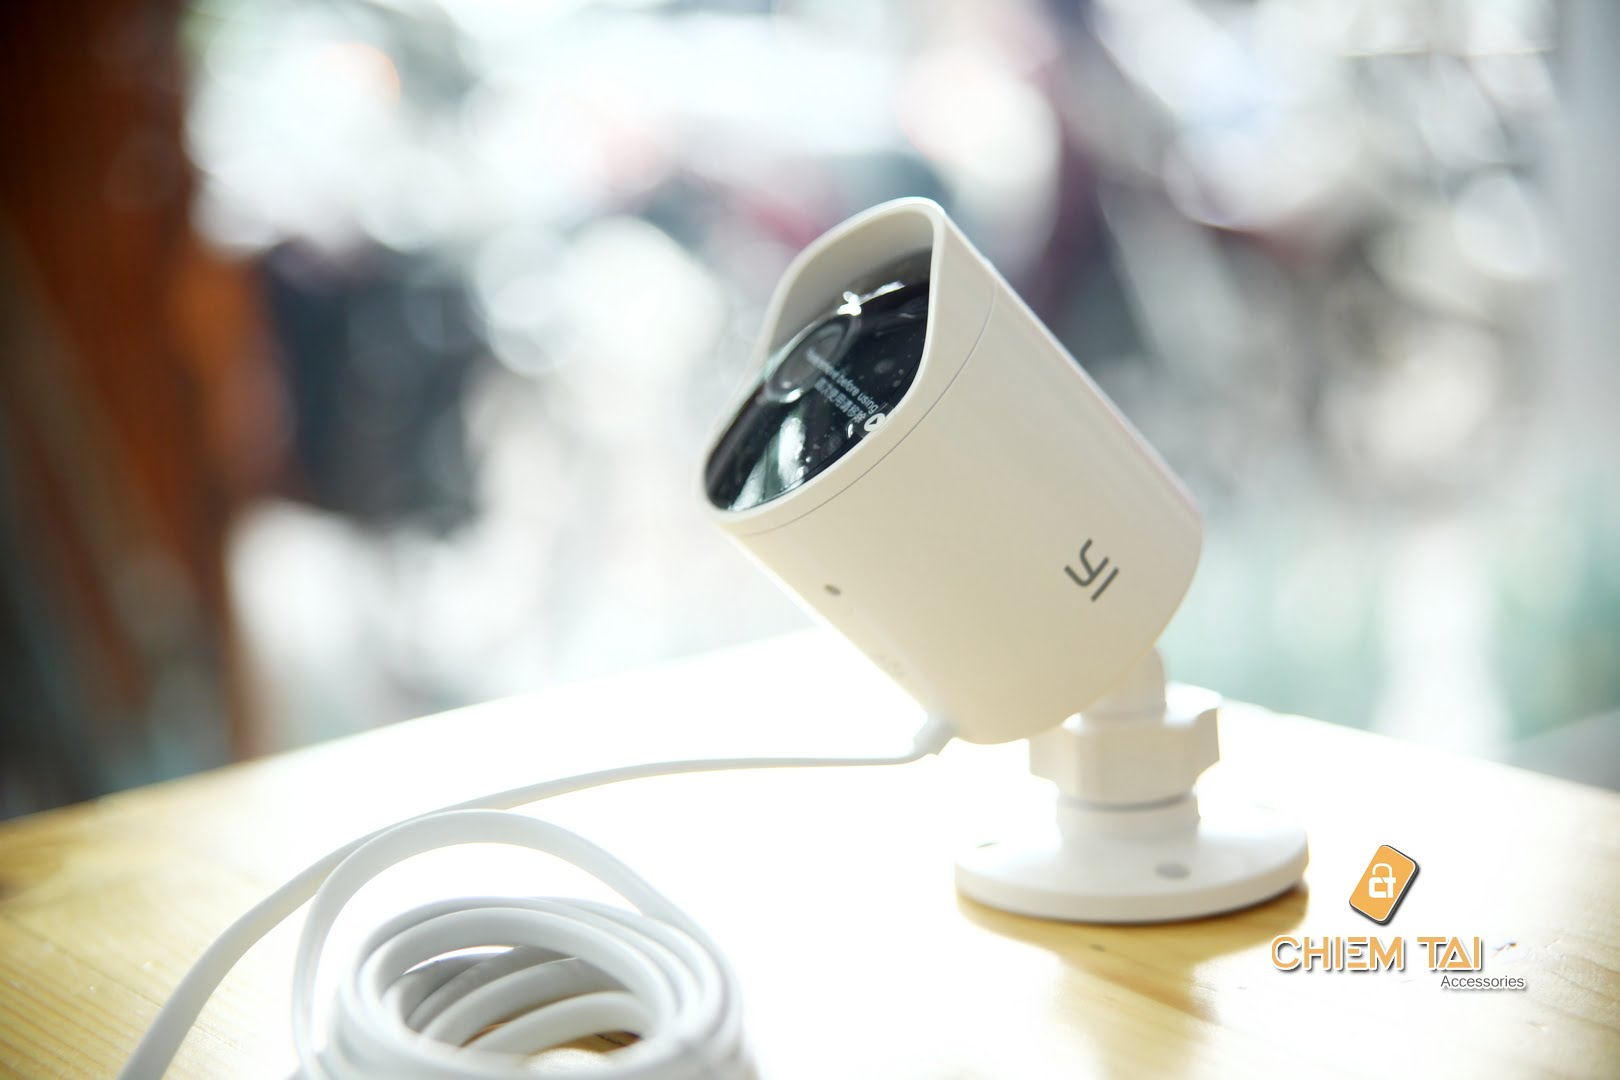 camera ip giam sat ngoai troi yi outdoor edition full hd 1080p ban quoc te 6007d41b43fd5